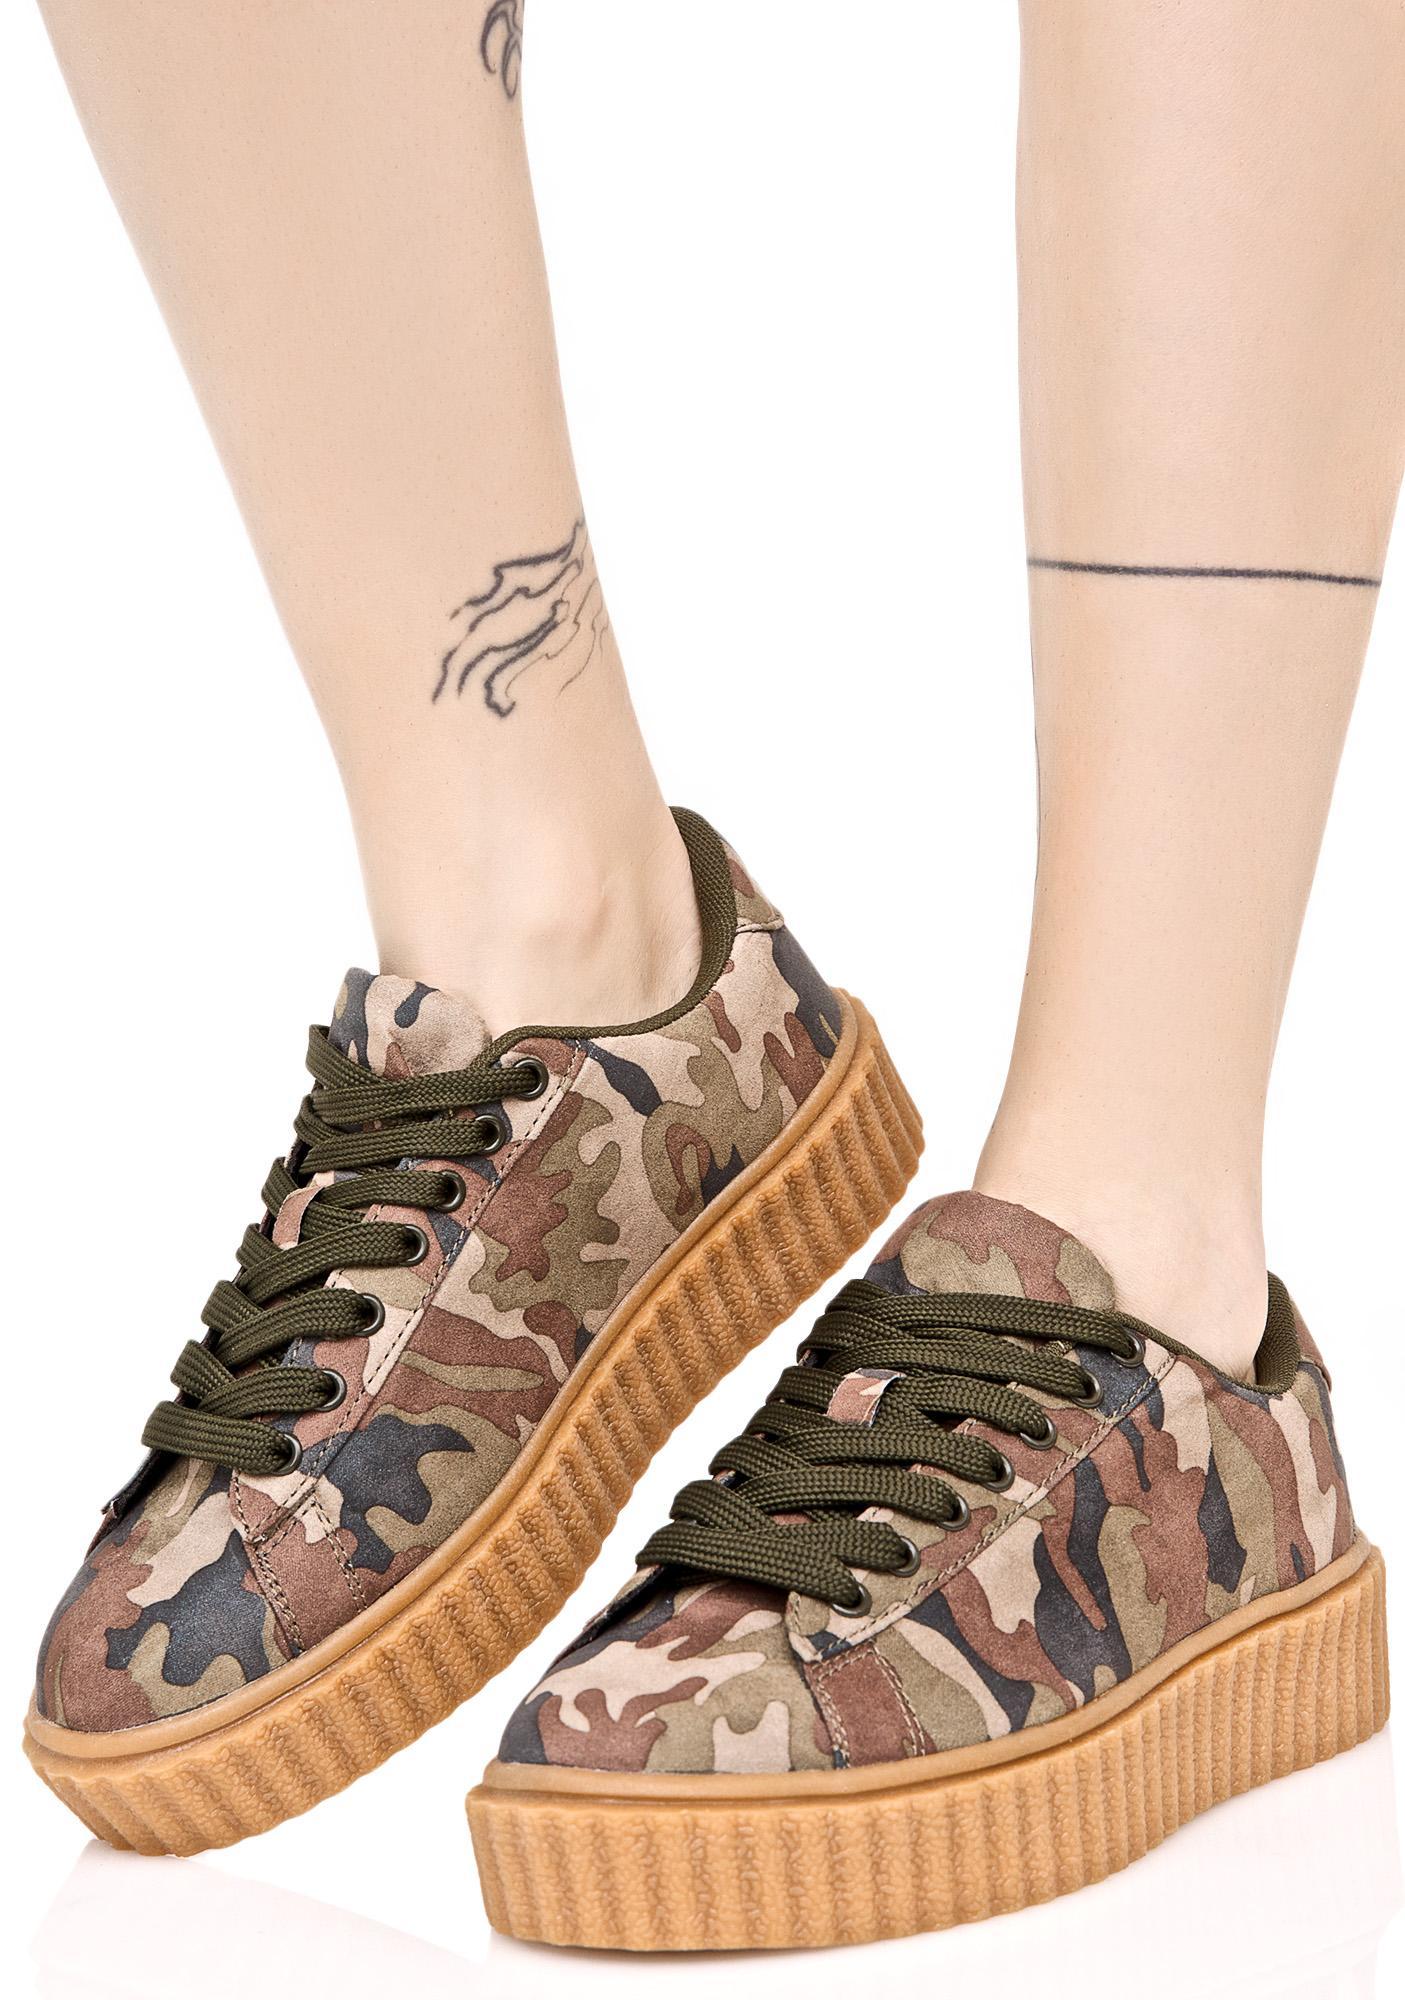 Camo Caught Me Creeper Sneakers